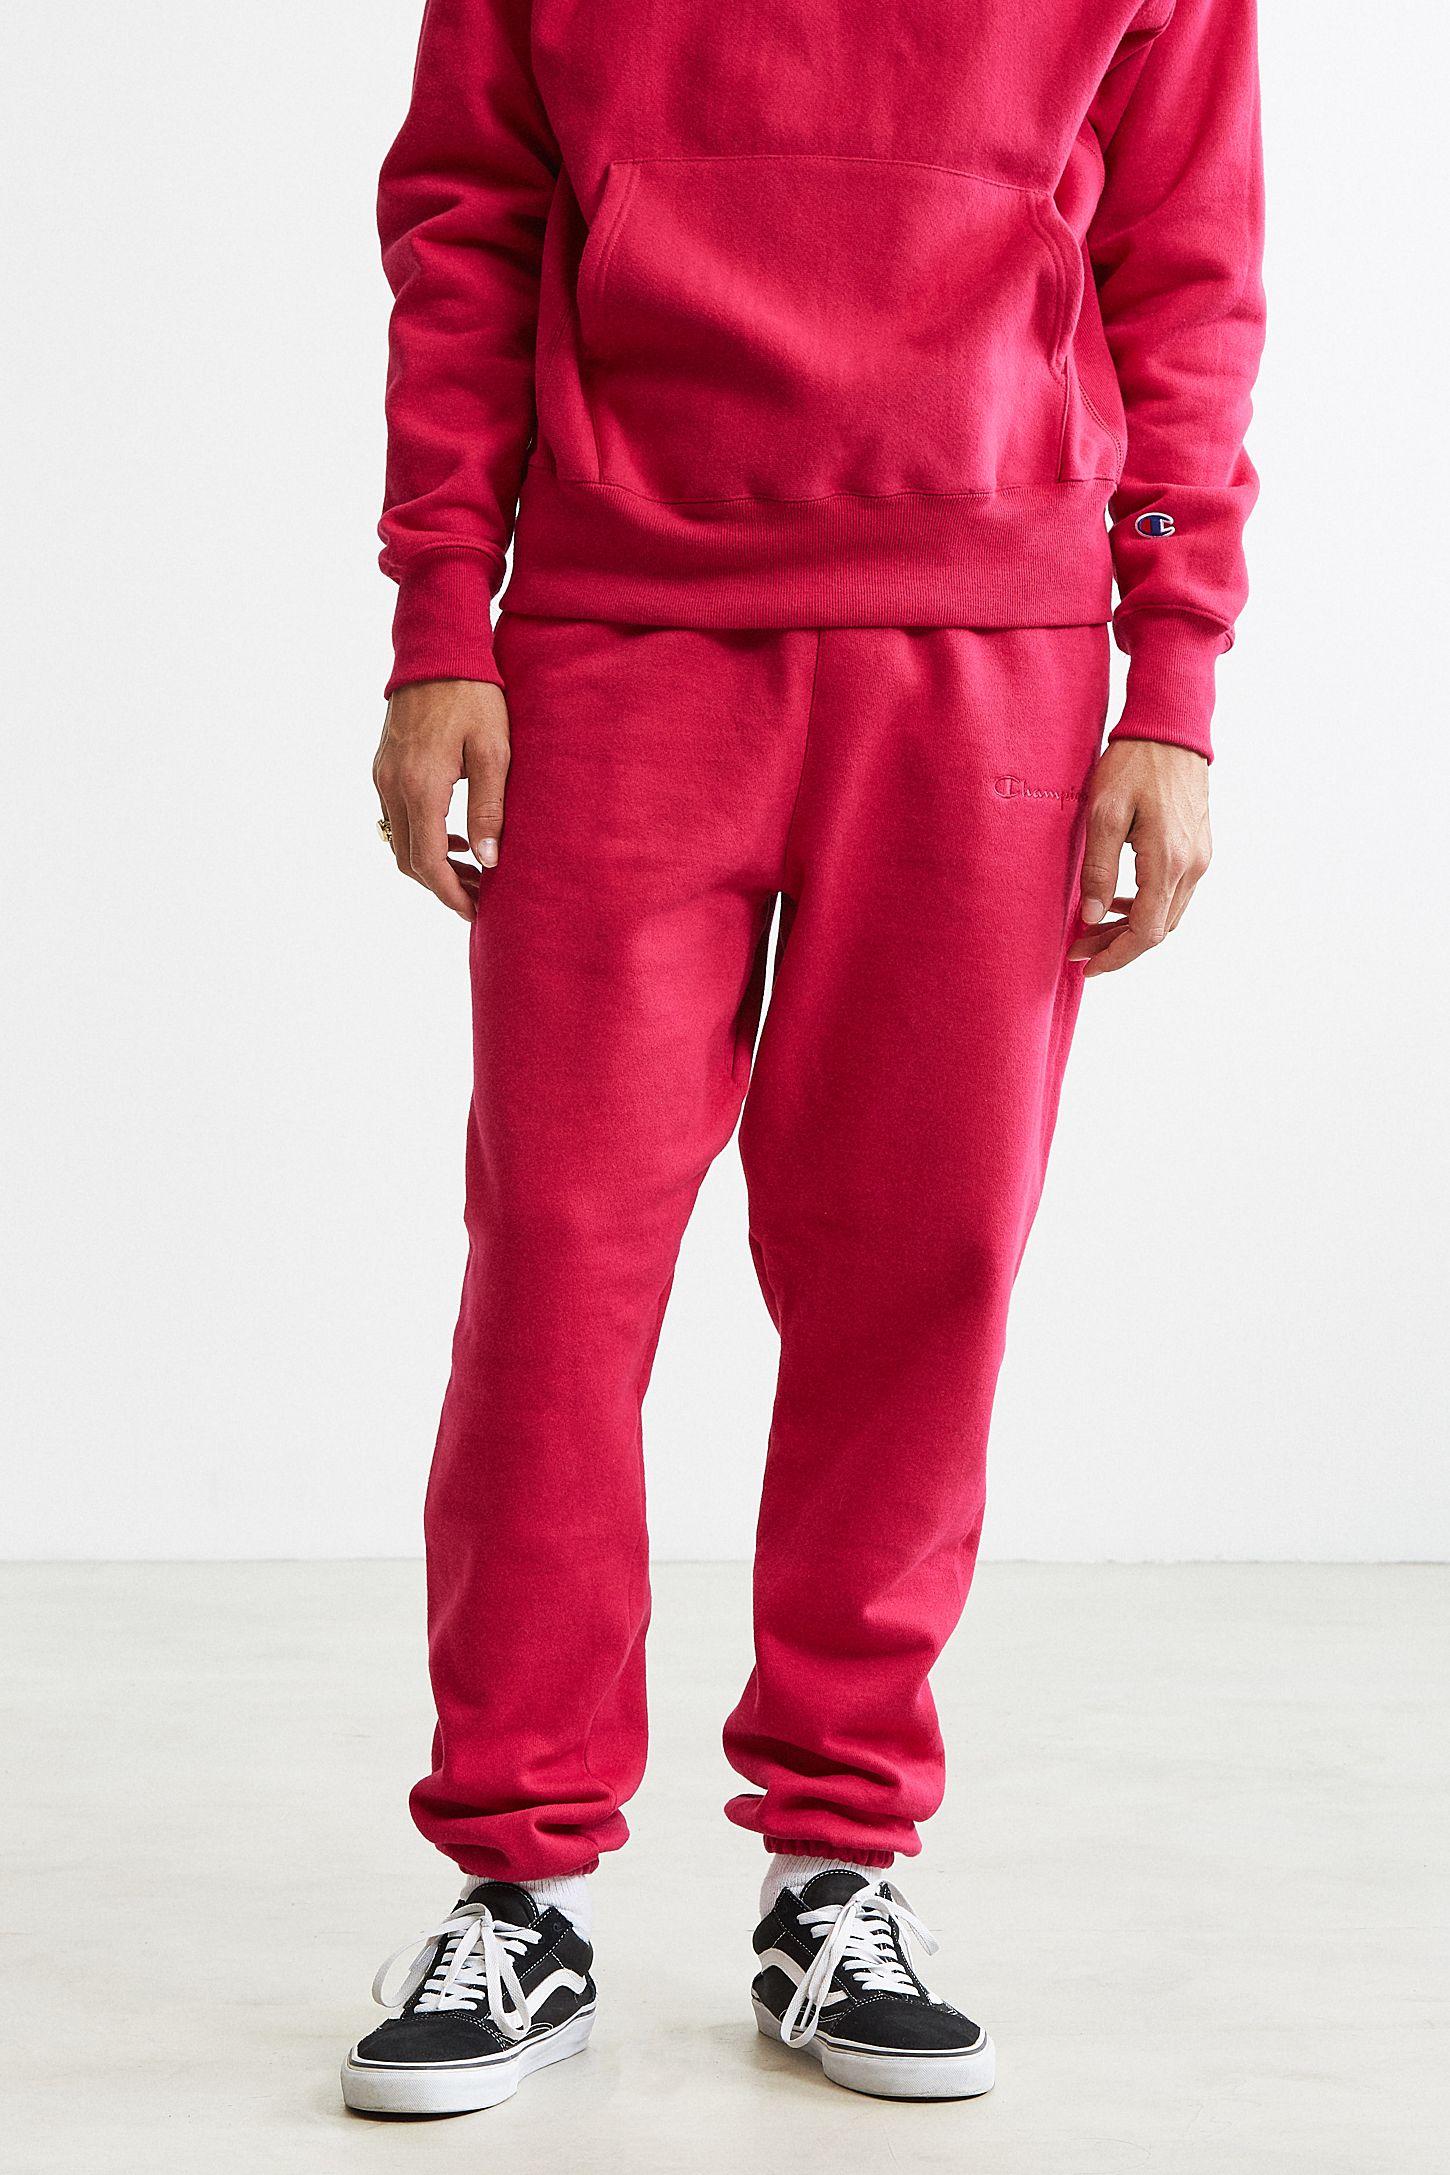 7f04a7a0967b Champion Reverse Weave Sweatpant